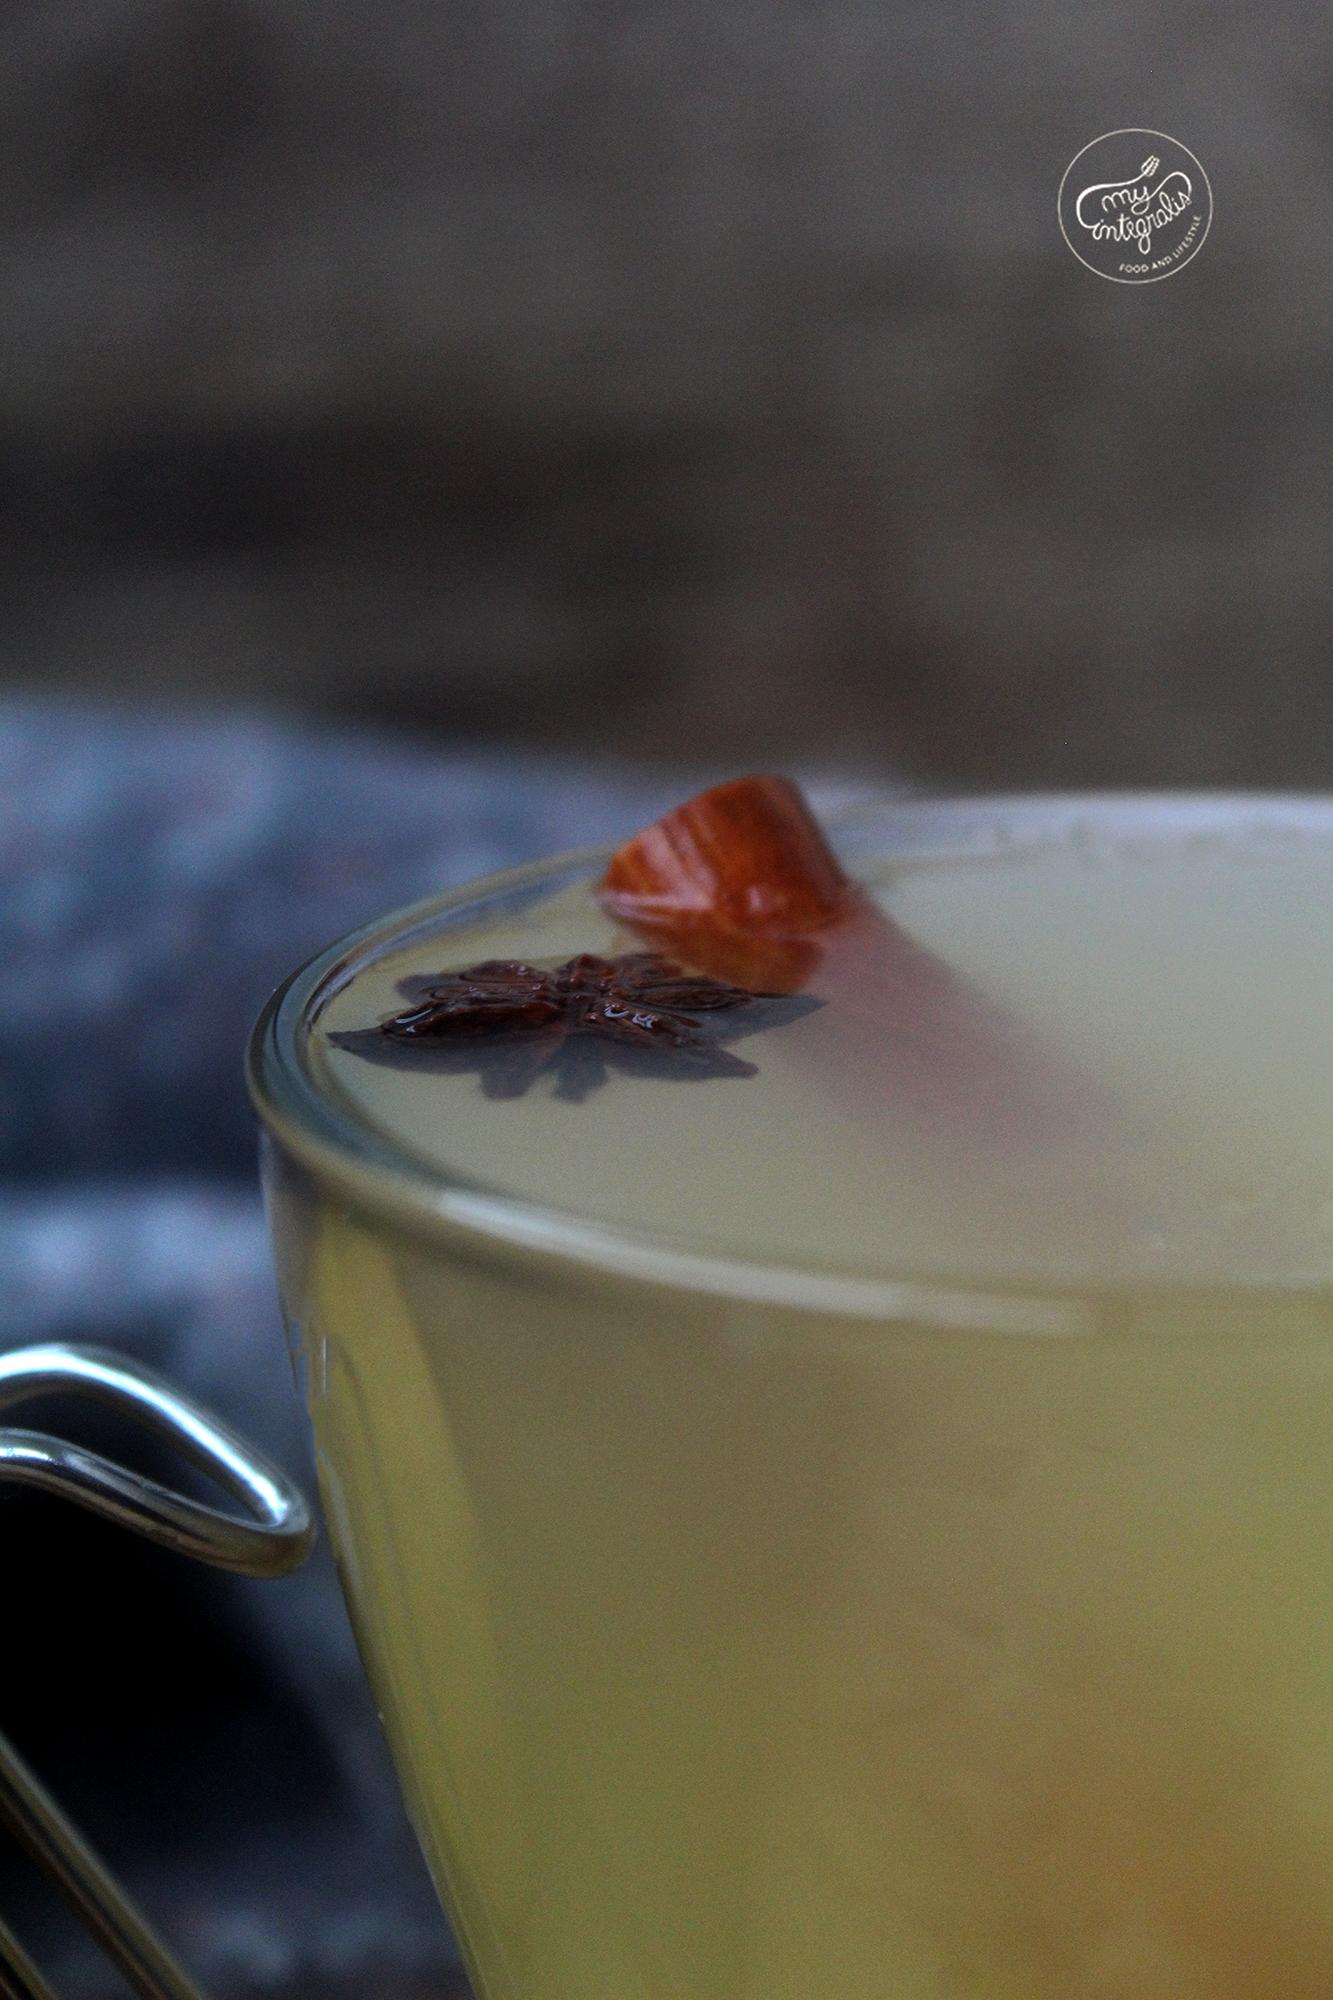 Chá cura constipações - myintegralis